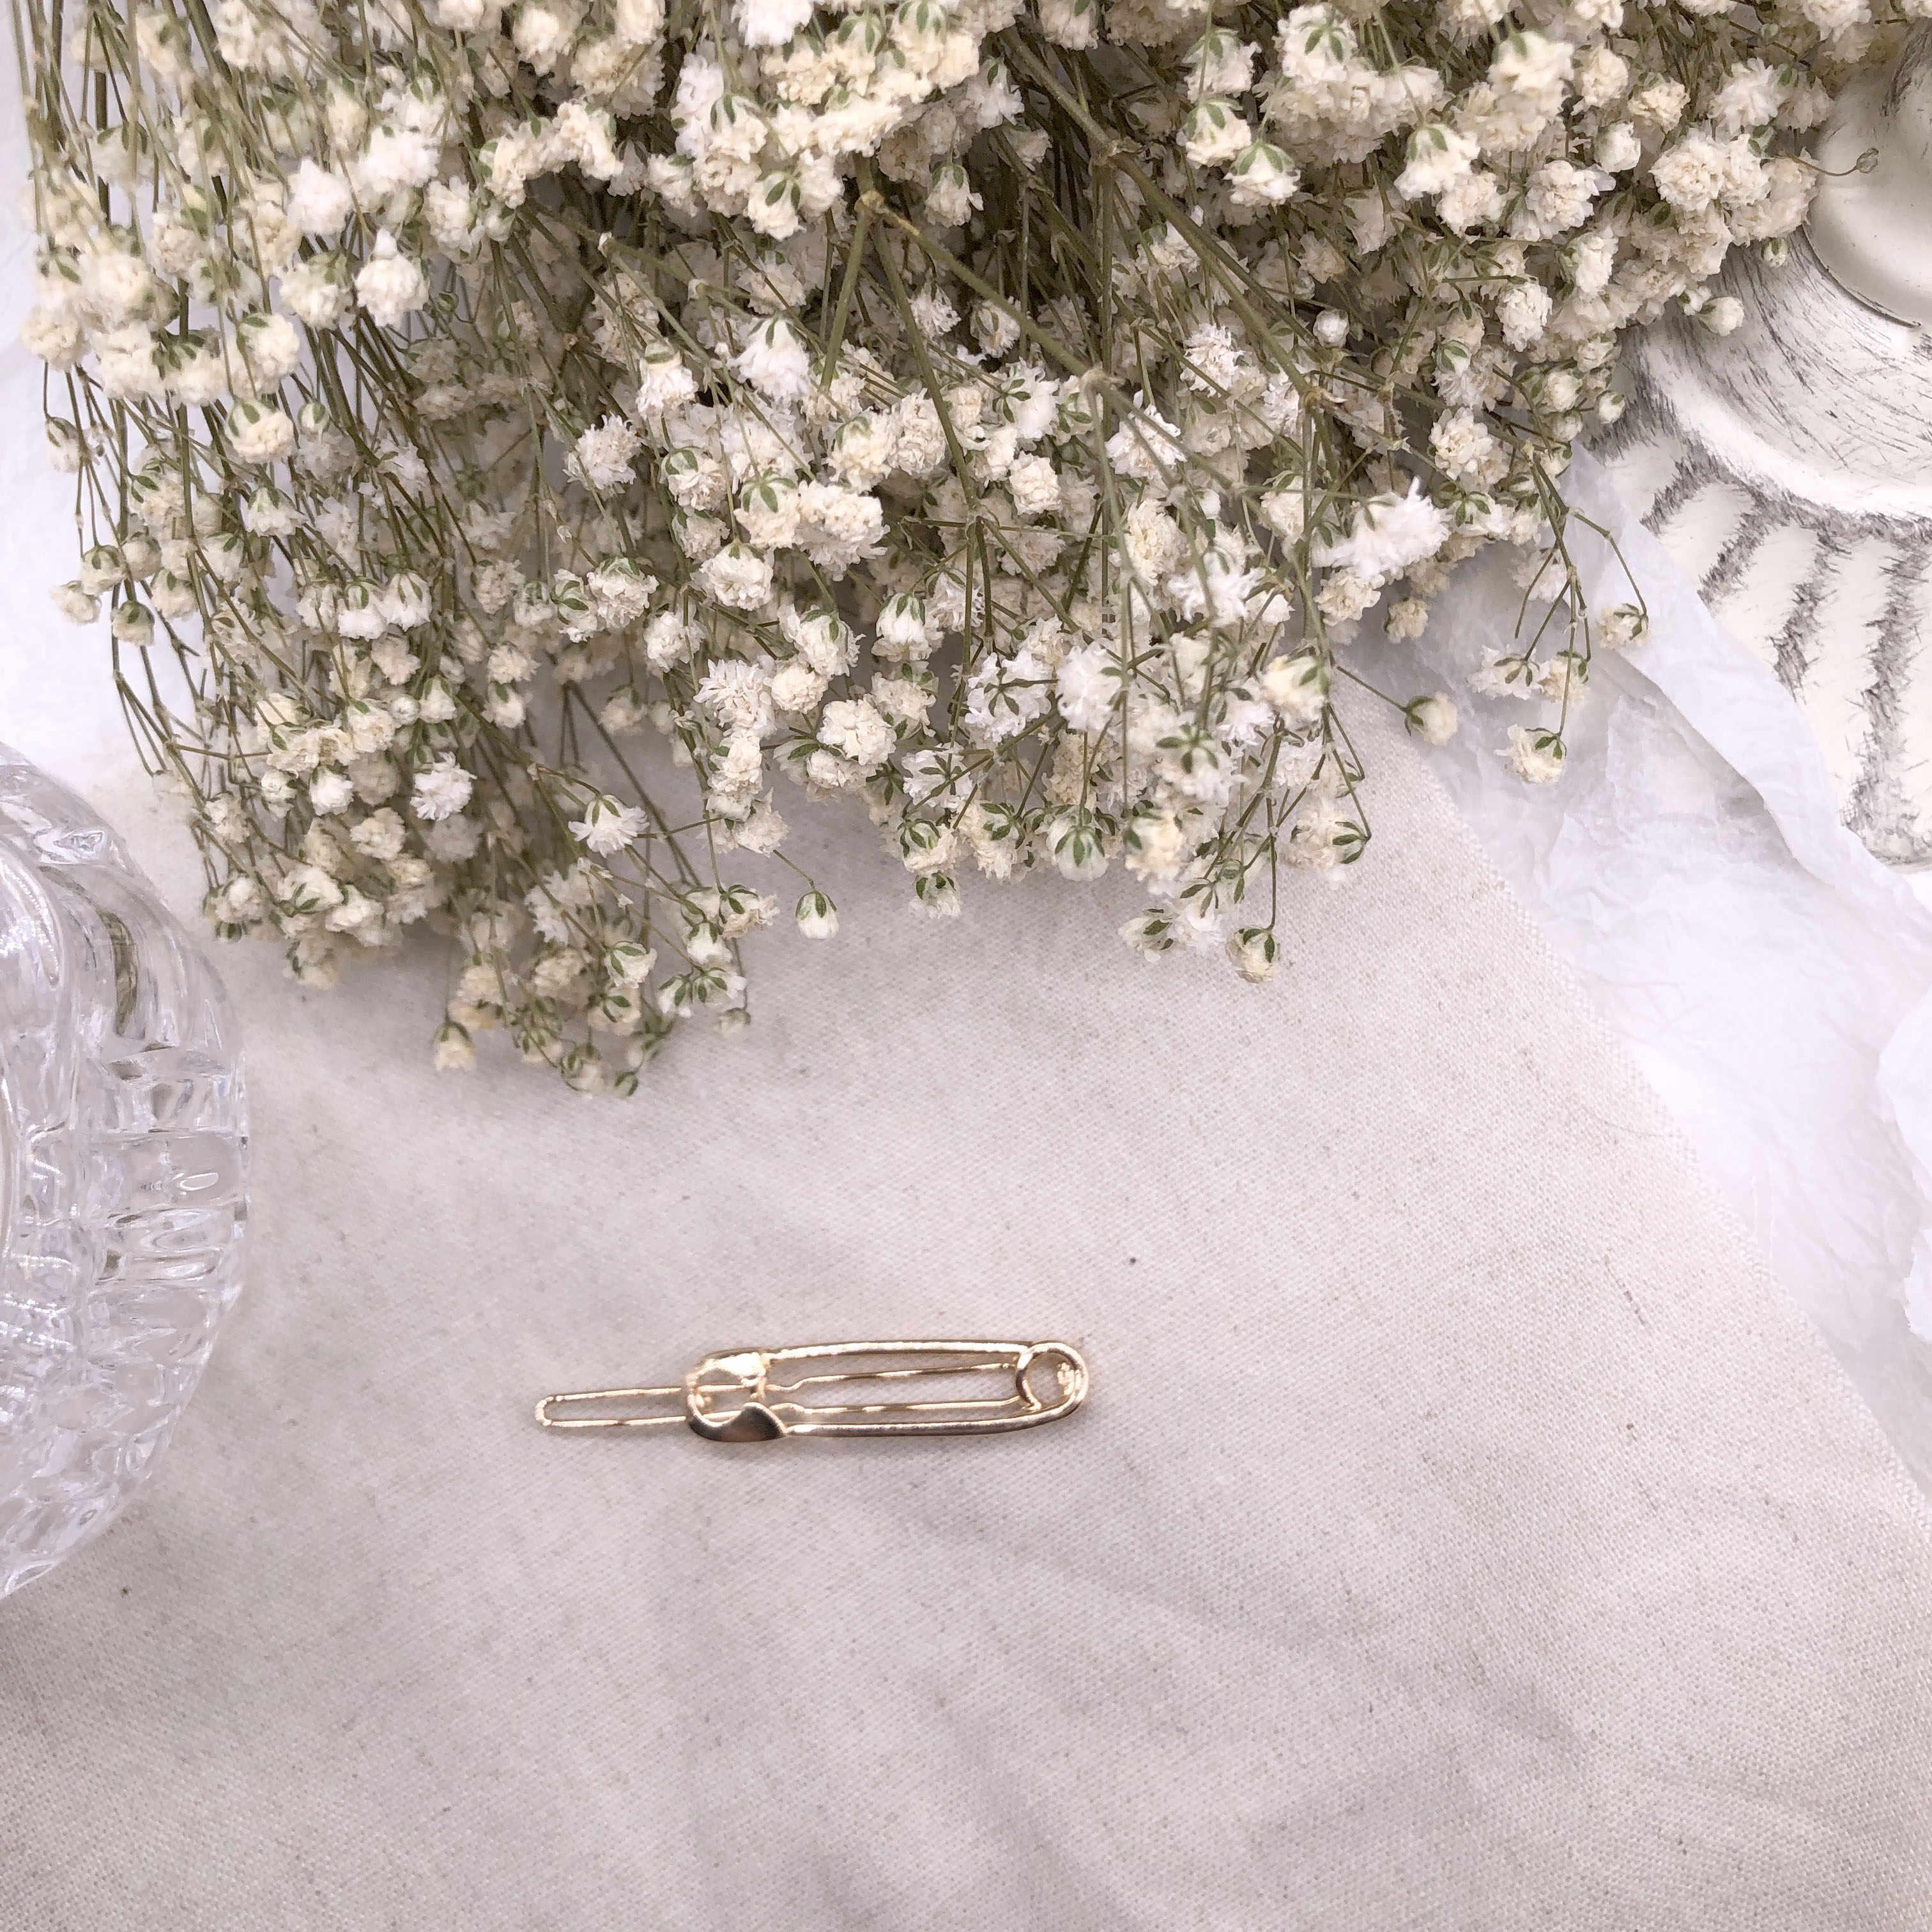 Indah Perhiasan Rambut Klip Logam Bentuk Hiasan Rambut Dihiasi Katak Klip Wanita Fashion Hadiah